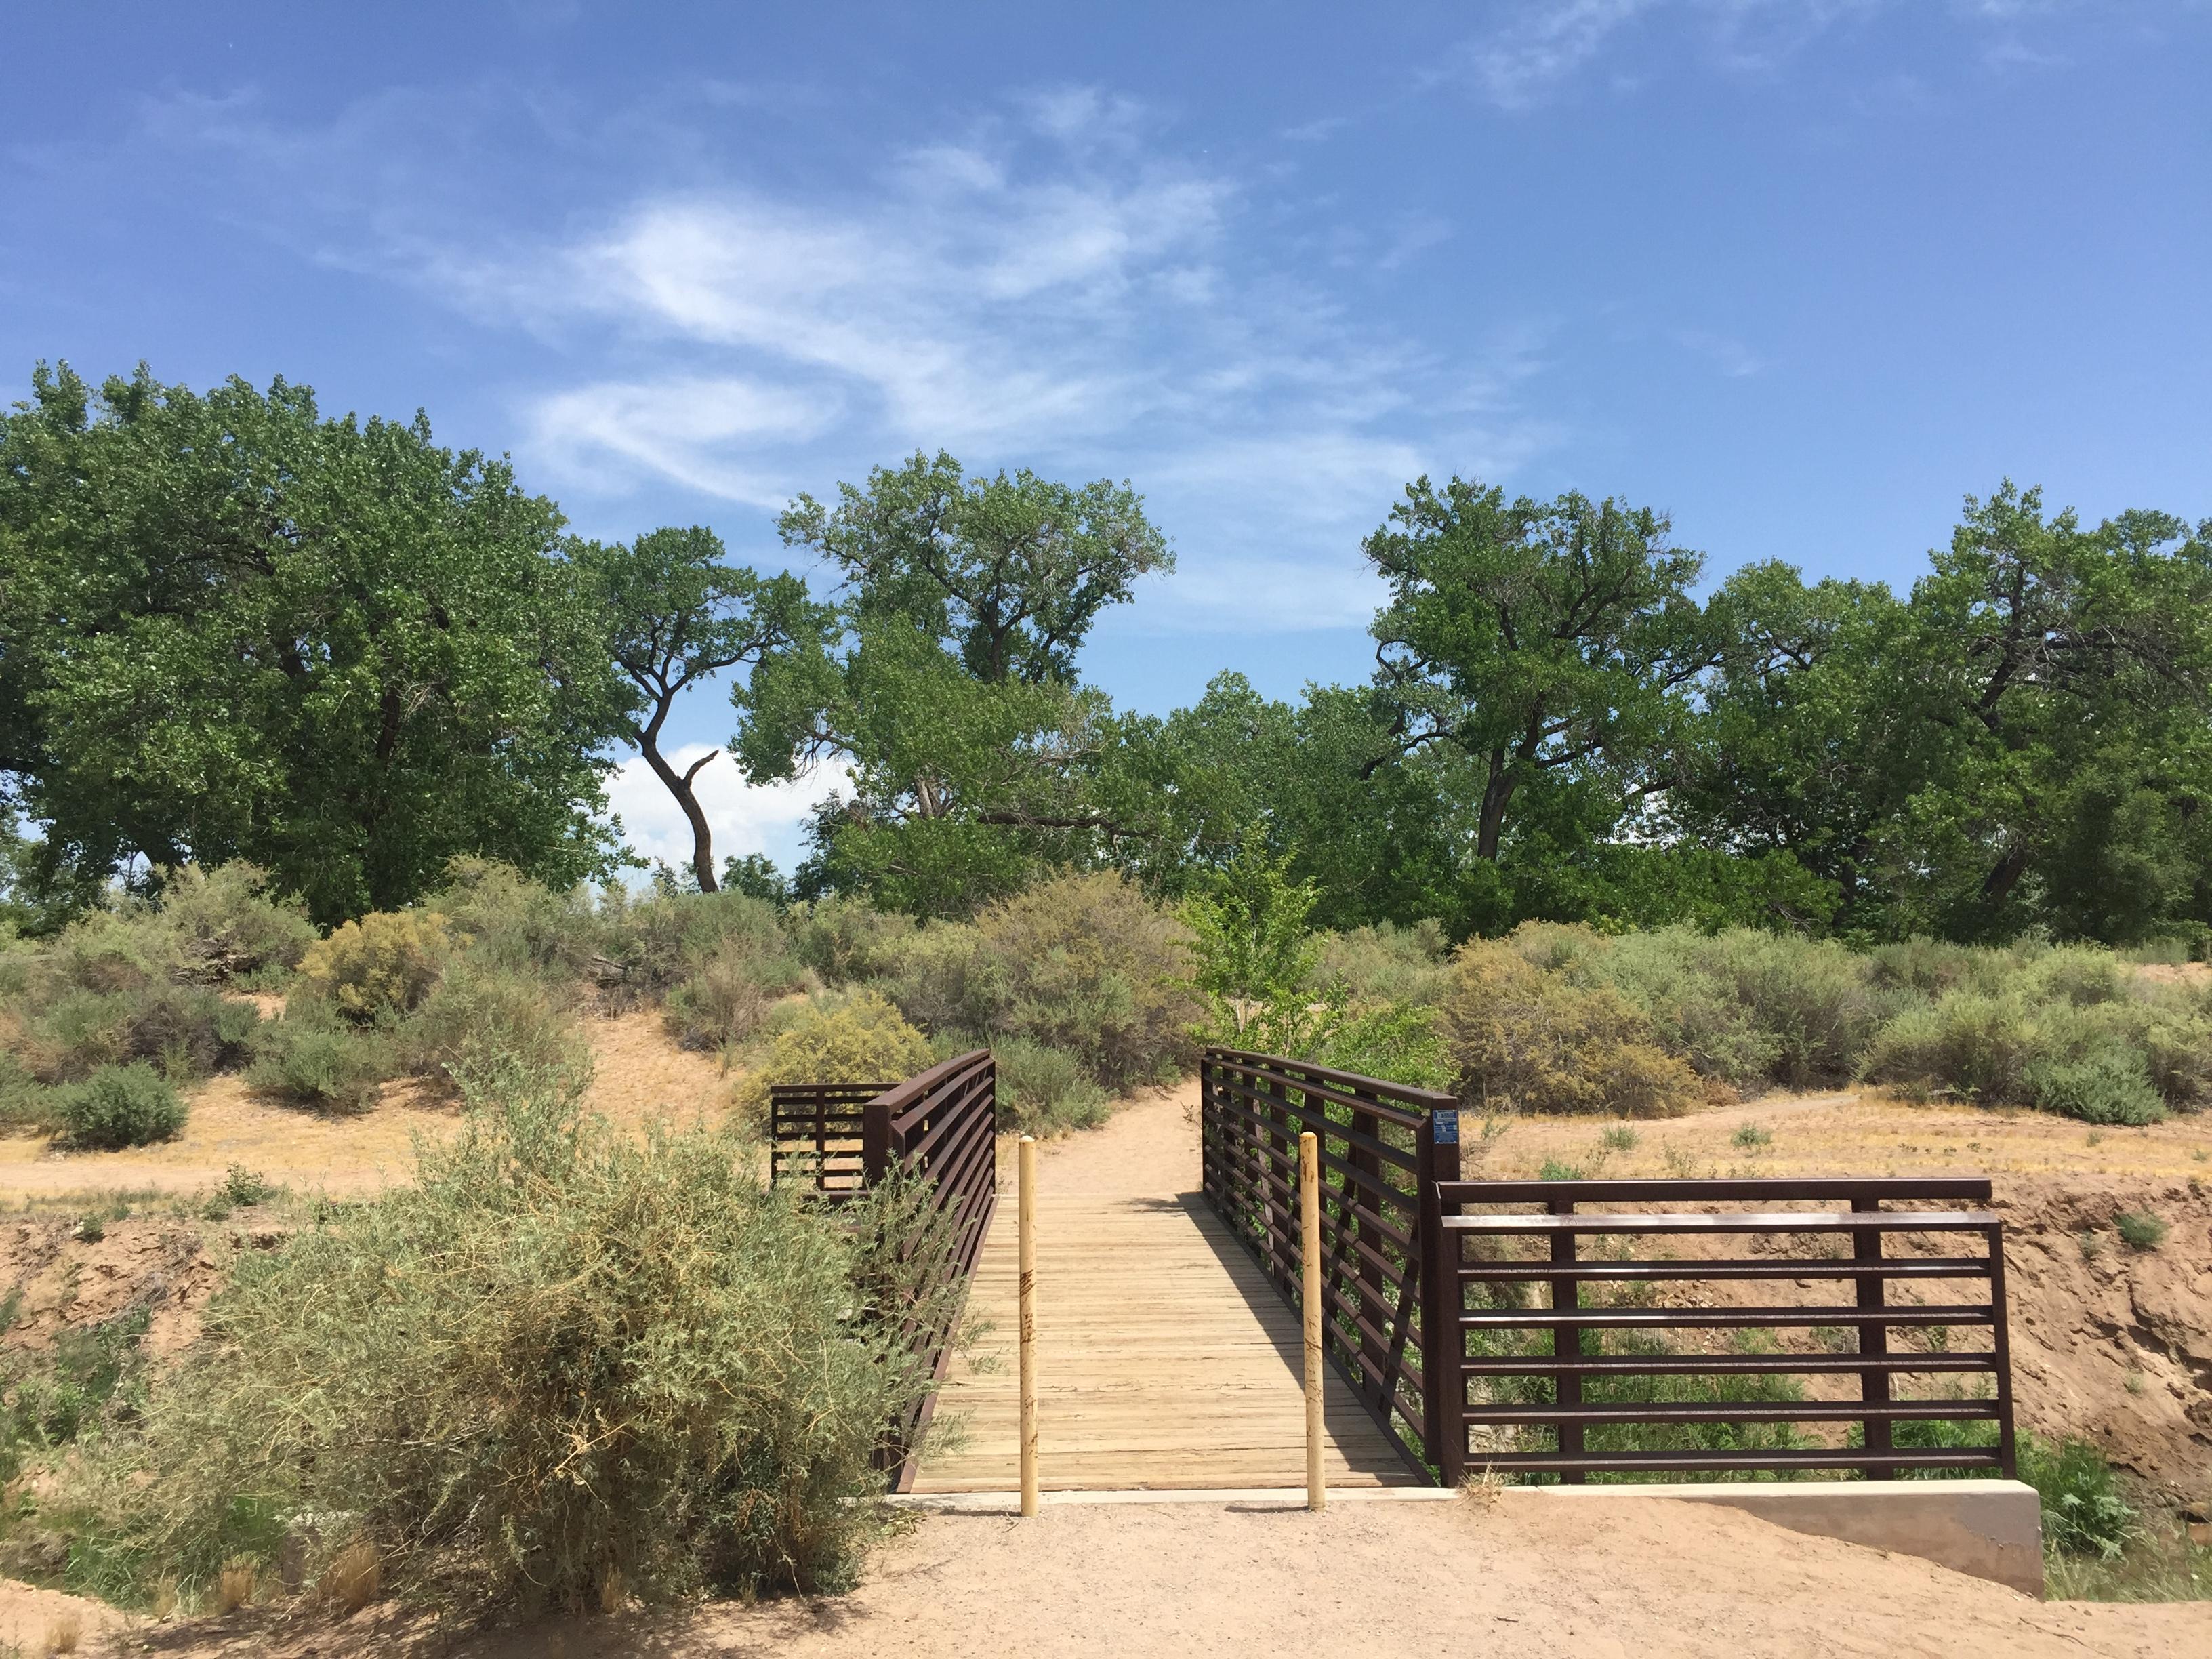 Preserving South Valley farmland